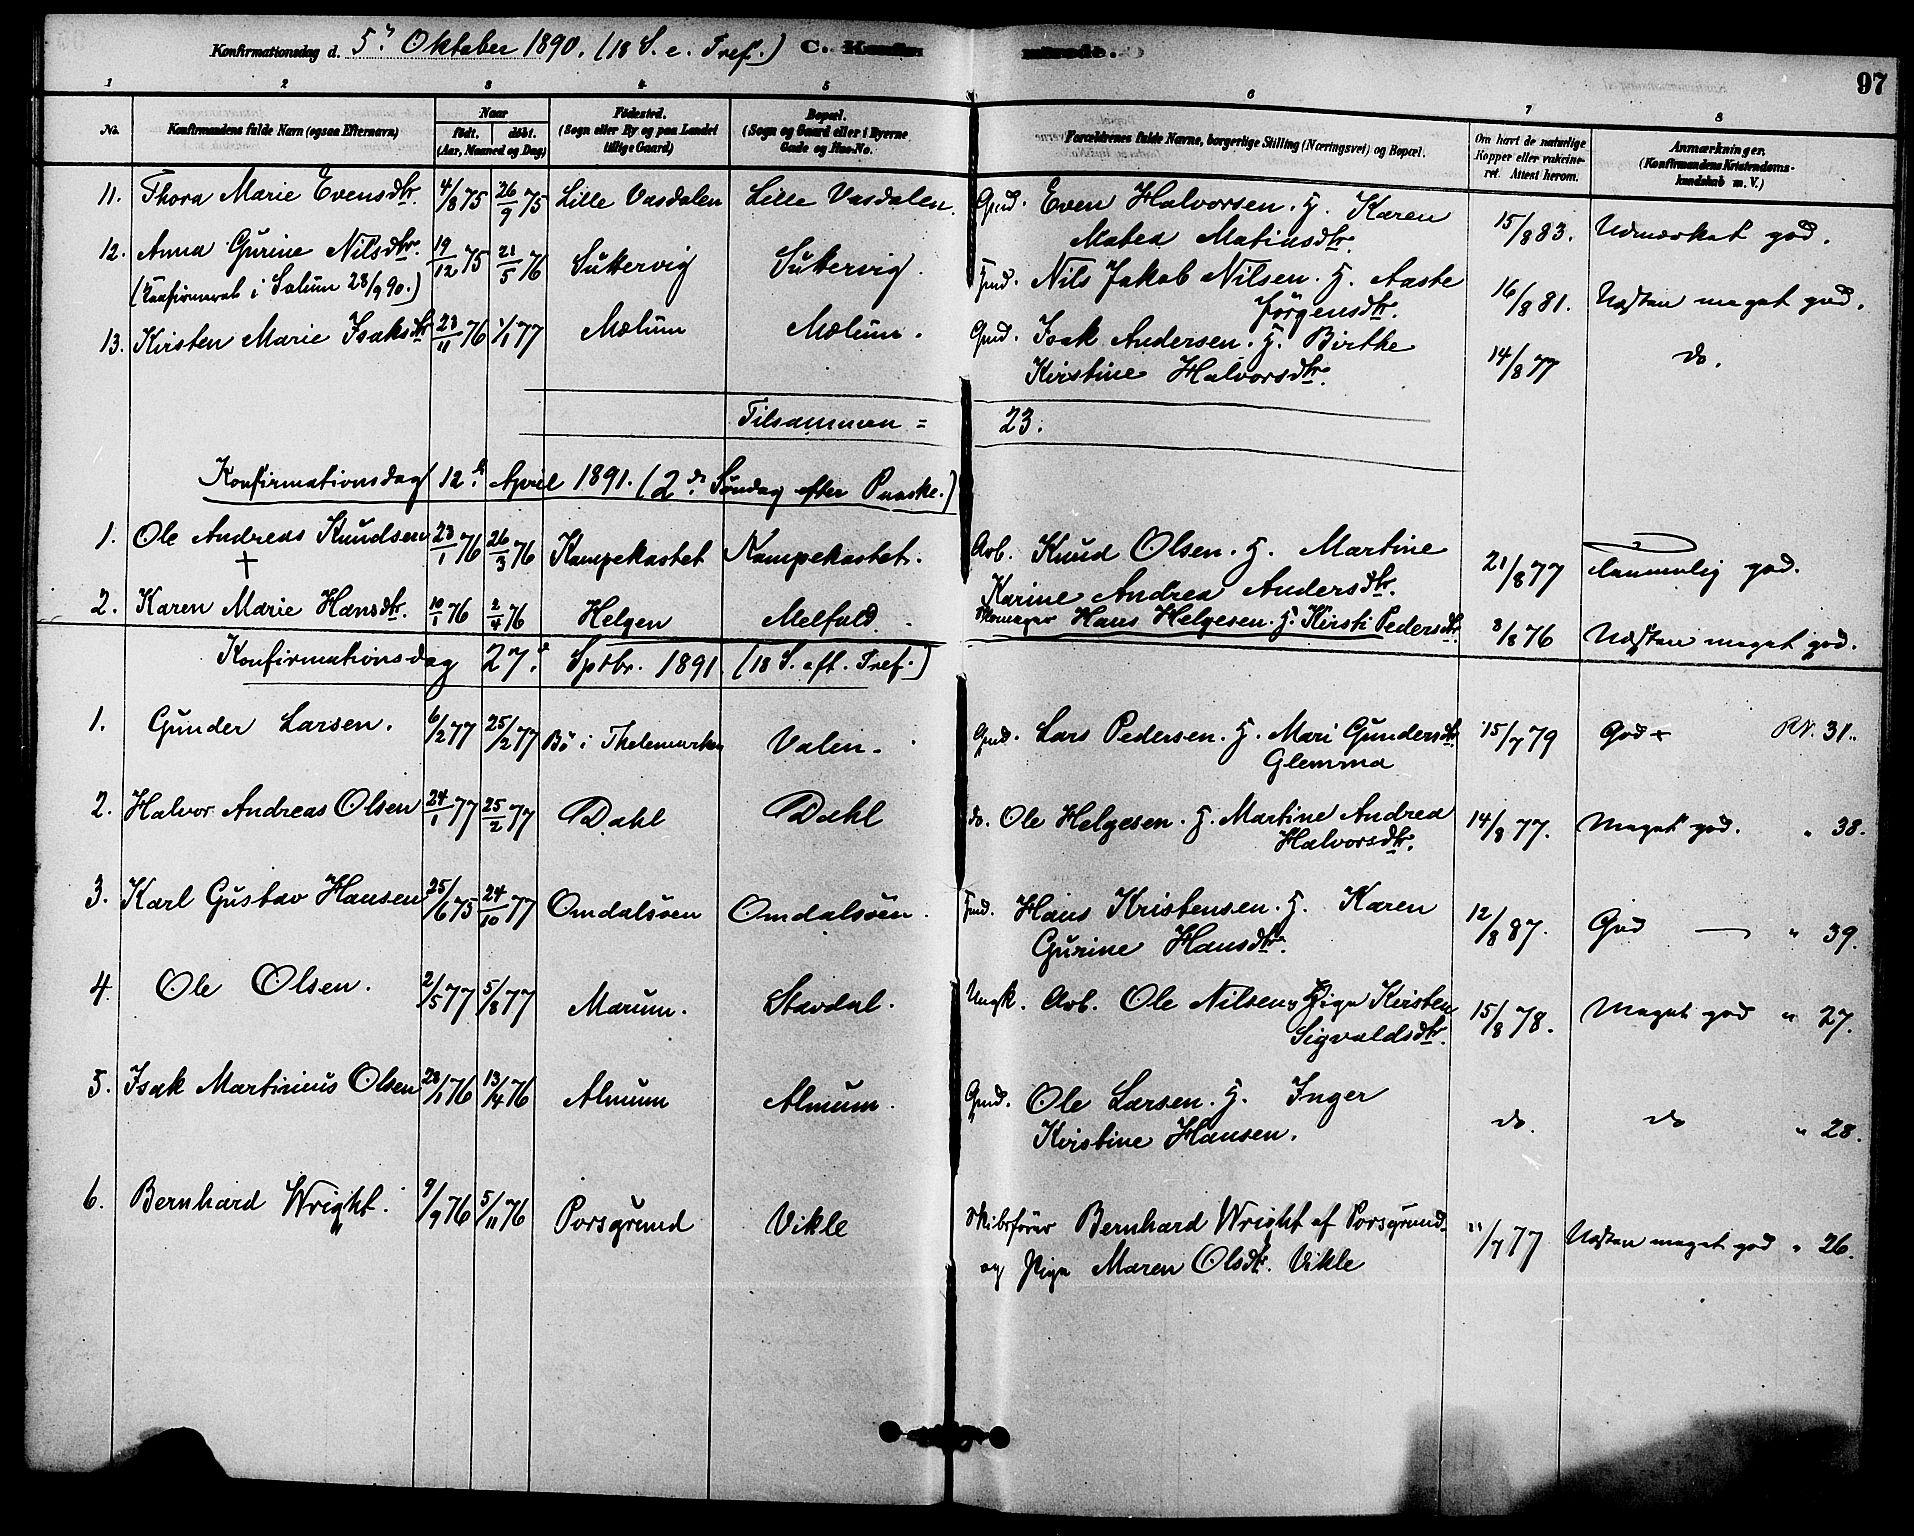 SAKO, Solum kirkebøker, F/Fb/L0001: Ministerialbok nr. II 1, 1877-1892, s. 97